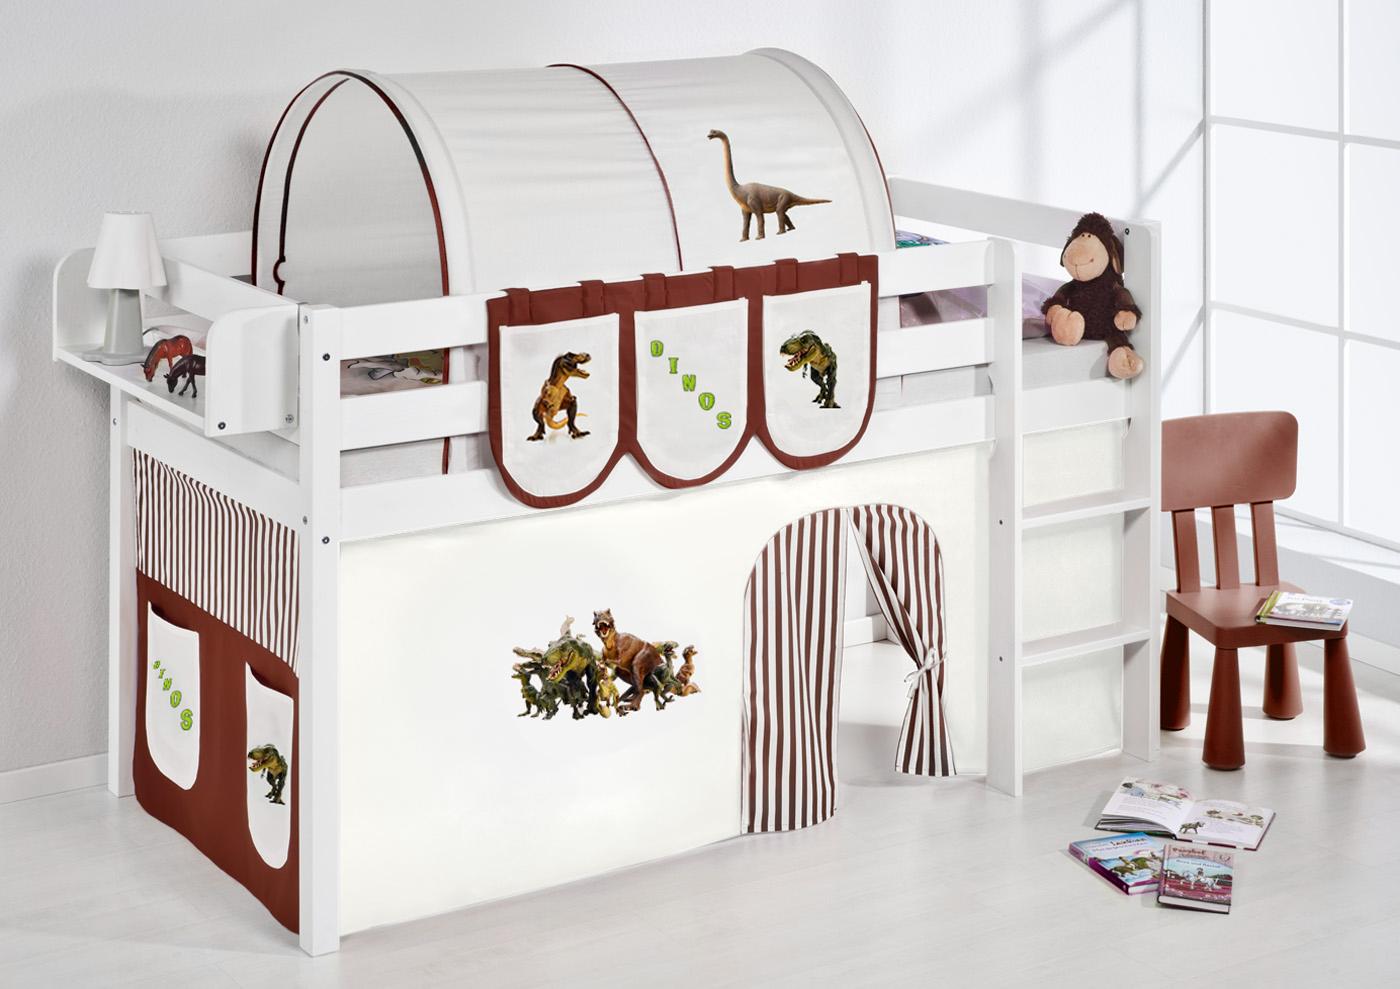 spielbett hochbett kinderbett kinder bett jelle 190x90 cm vorhang nach wahl ebay. Black Bedroom Furniture Sets. Home Design Ideas